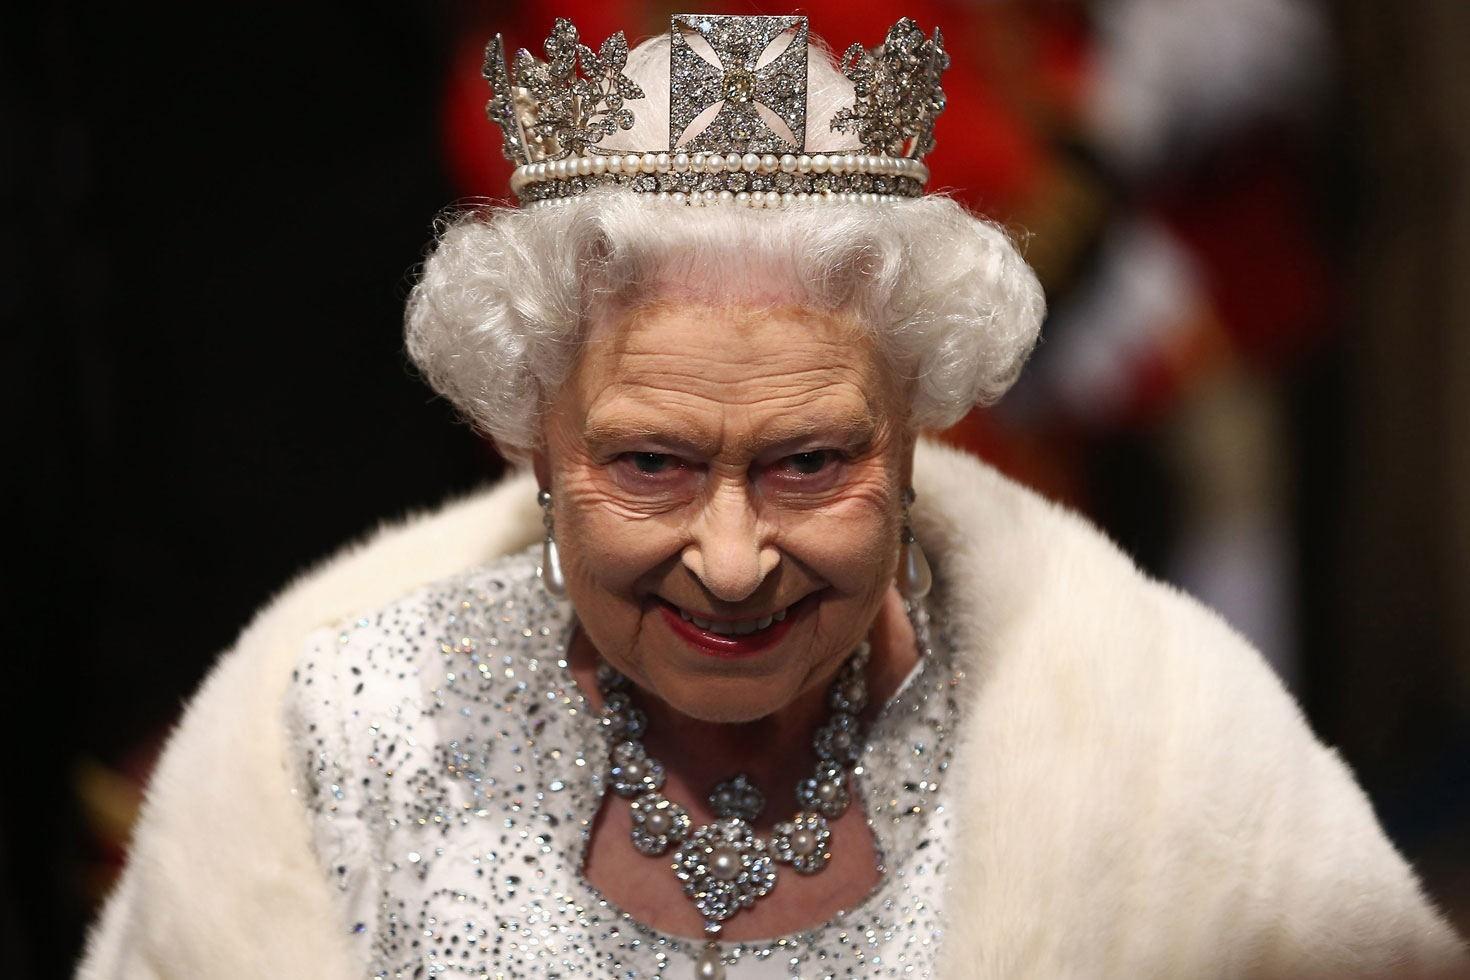 La corona Británica, reina Isabel II - Cortesía